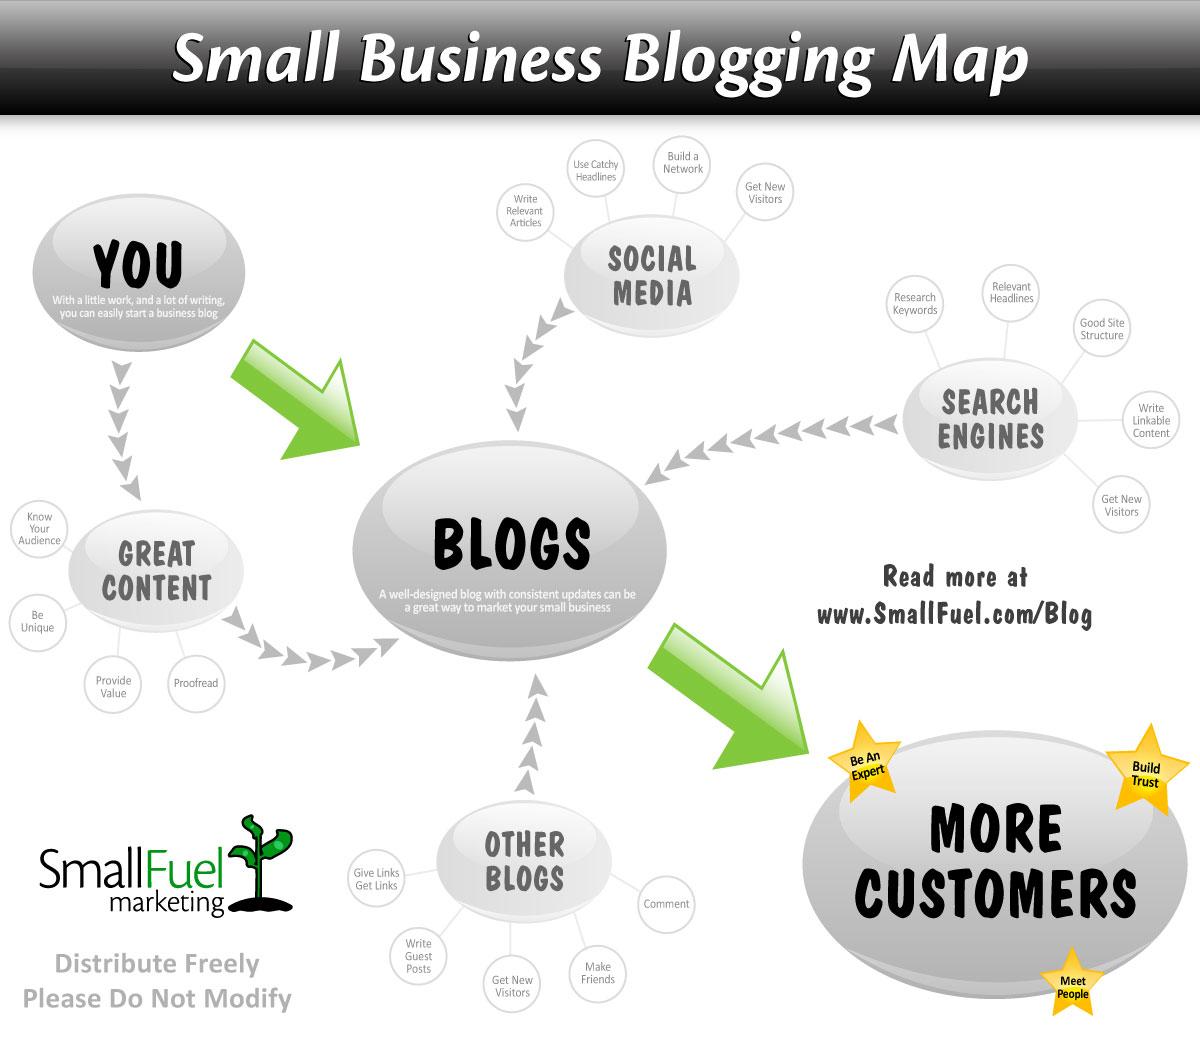 Blog: 10 Tasty Blog Stats That Prove You Should Be Blogging